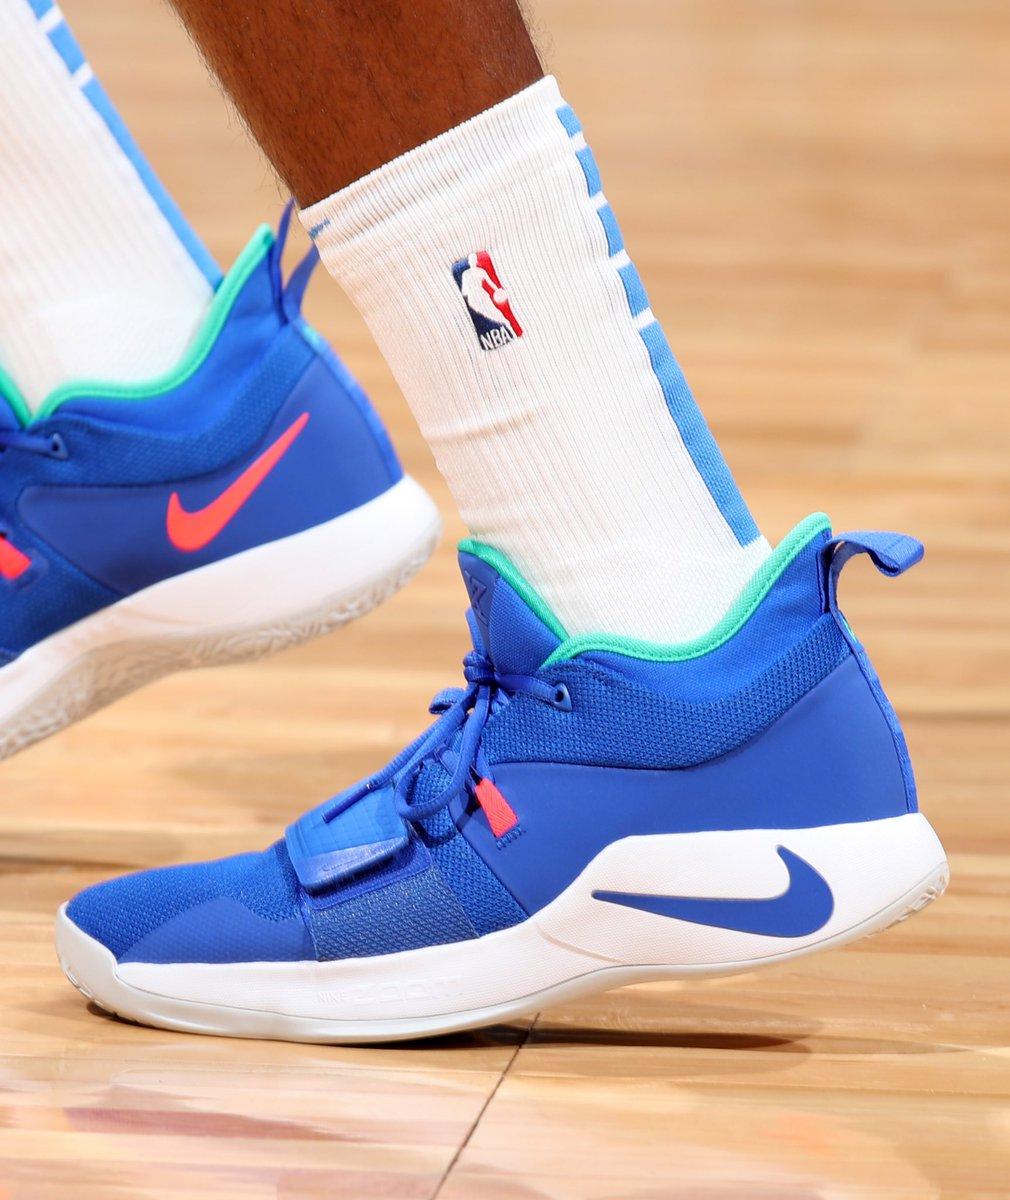 quality design 09dac 536e2 Nike Jordan Johnson : SoleWatch Yg Trece putting shots ...